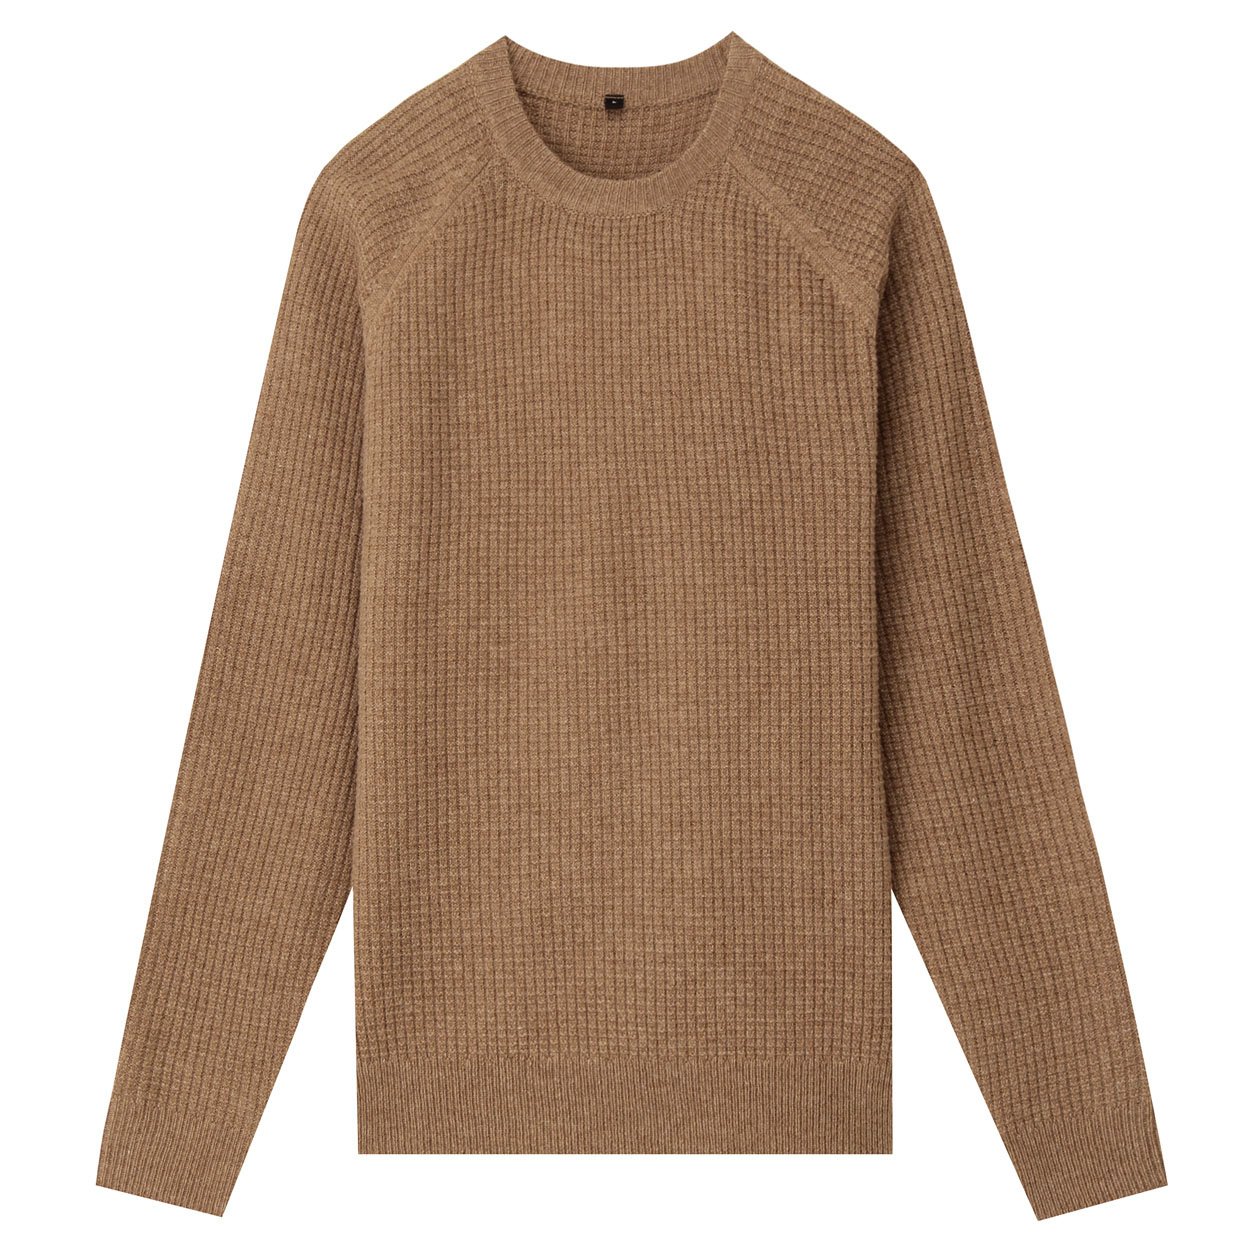 8e23b46d580b4 USD 132.88  Muji men s merino wool waffle knit sweater - Wholesale ...